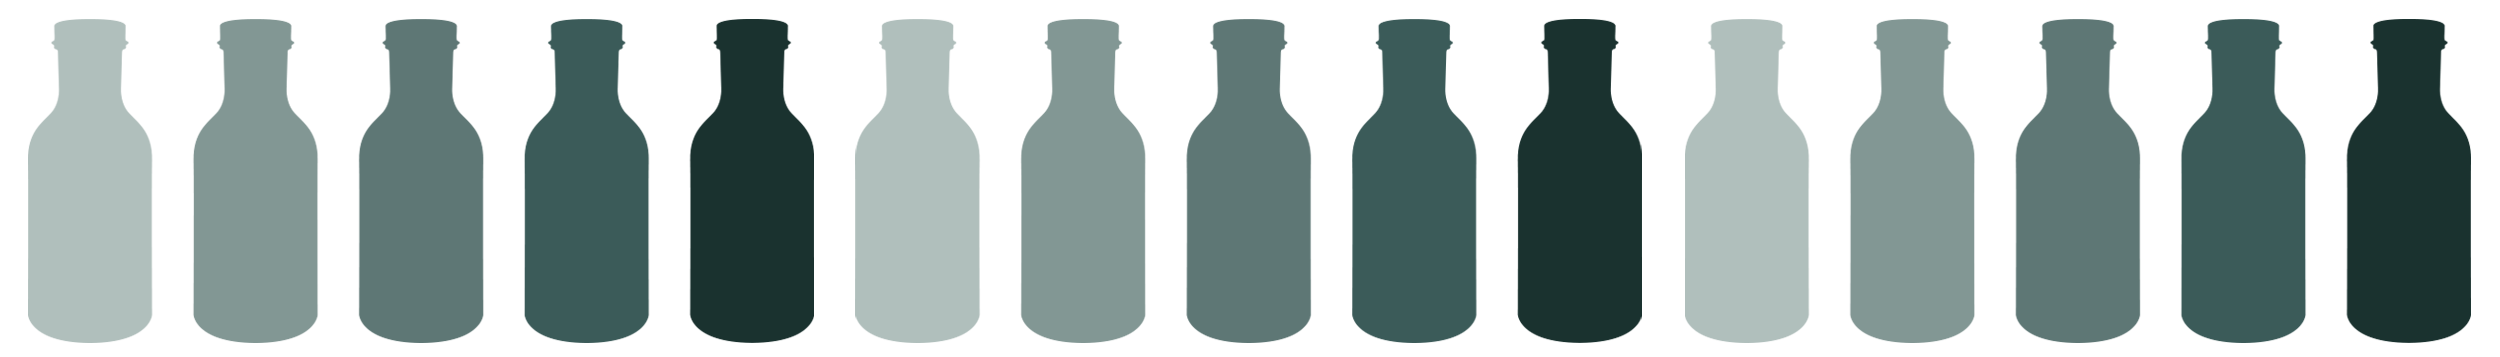 New Bottle Border.png